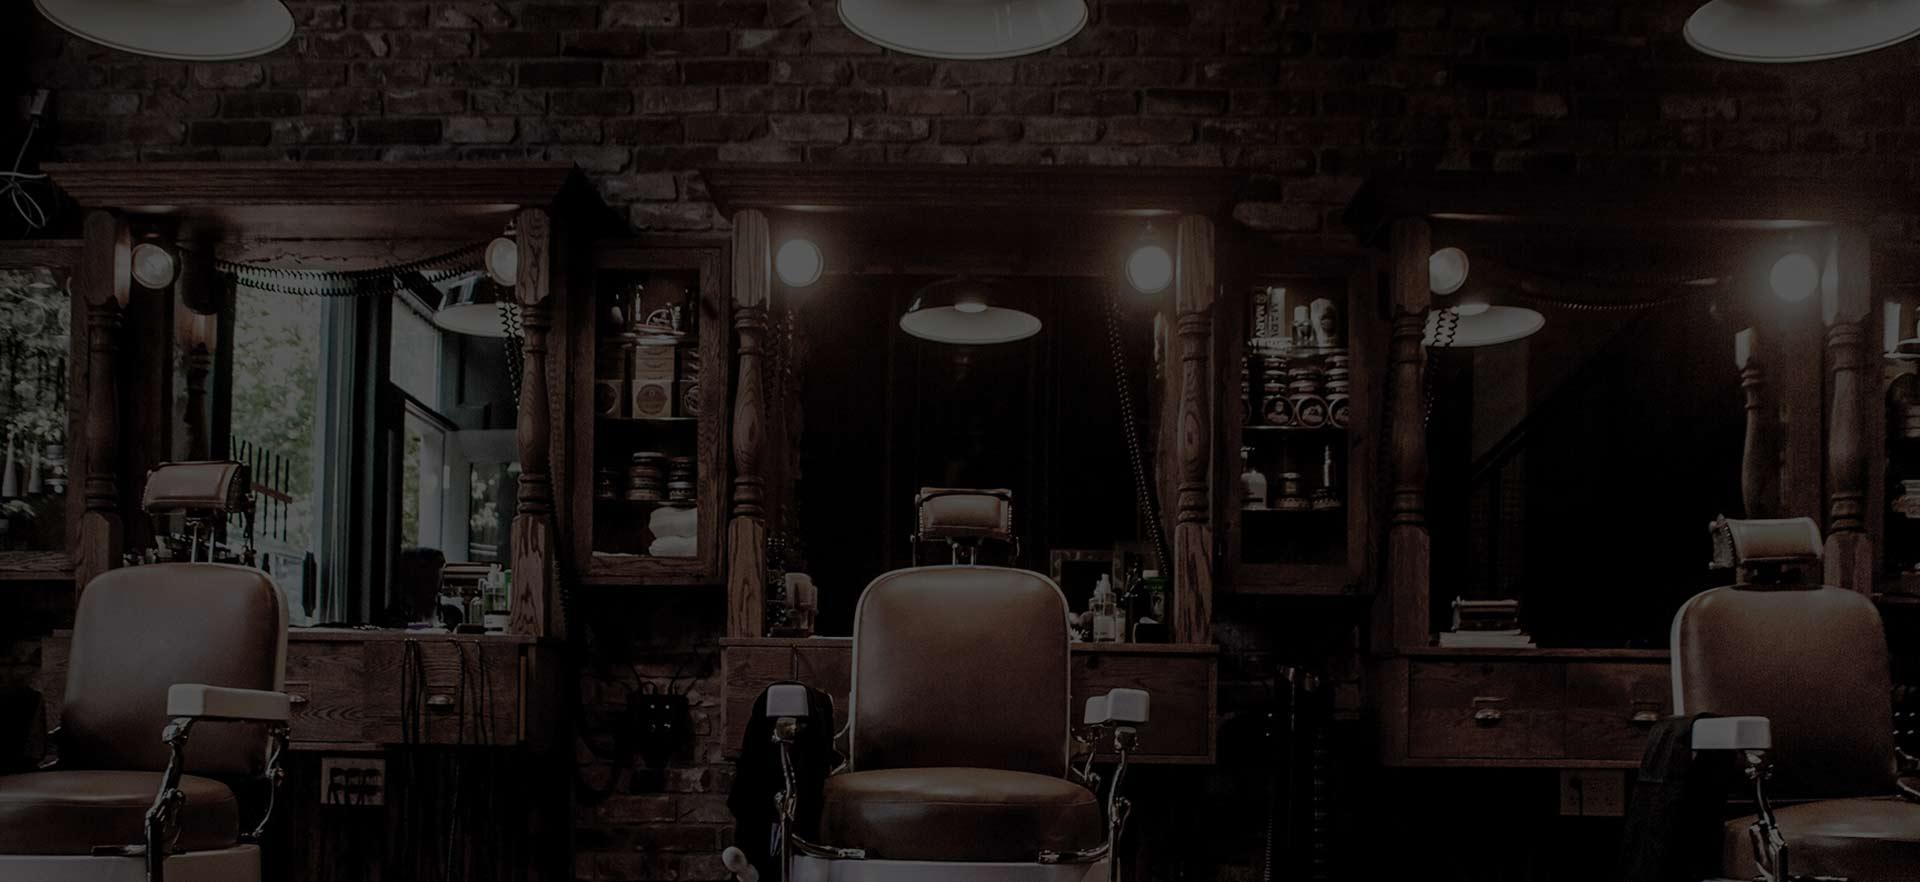 arredamento parrucchieri morini